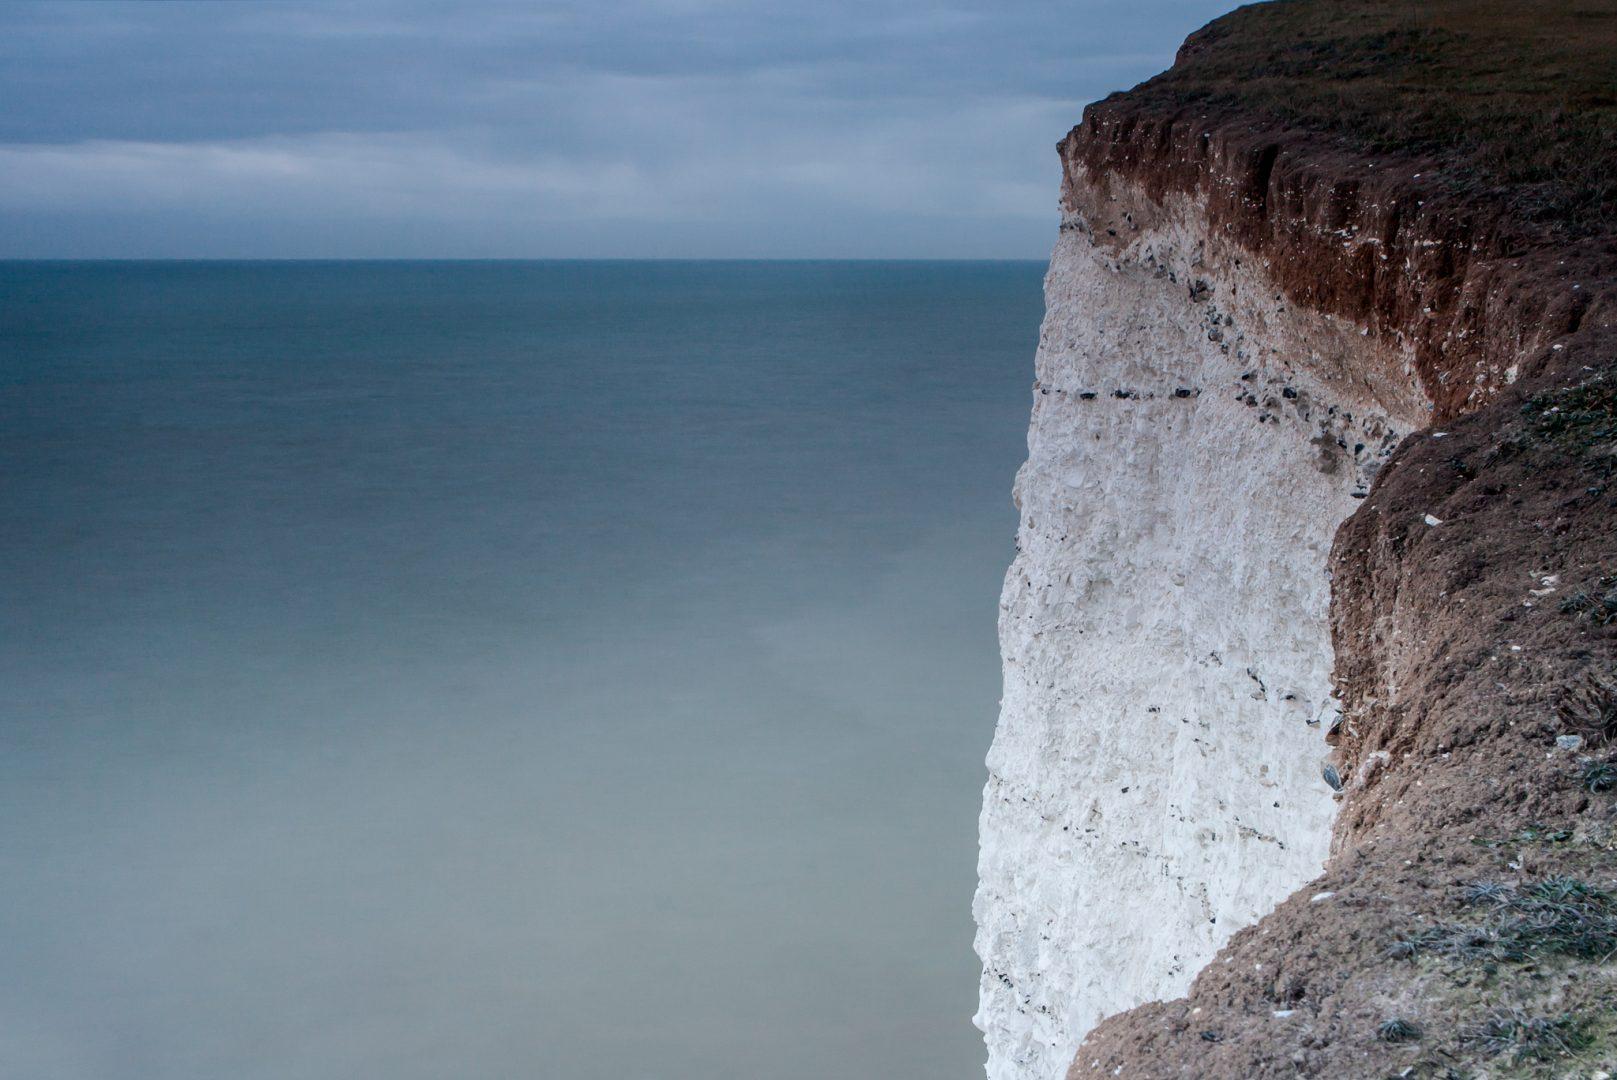 beachy-head-level-horizons-1617x1080.jpg